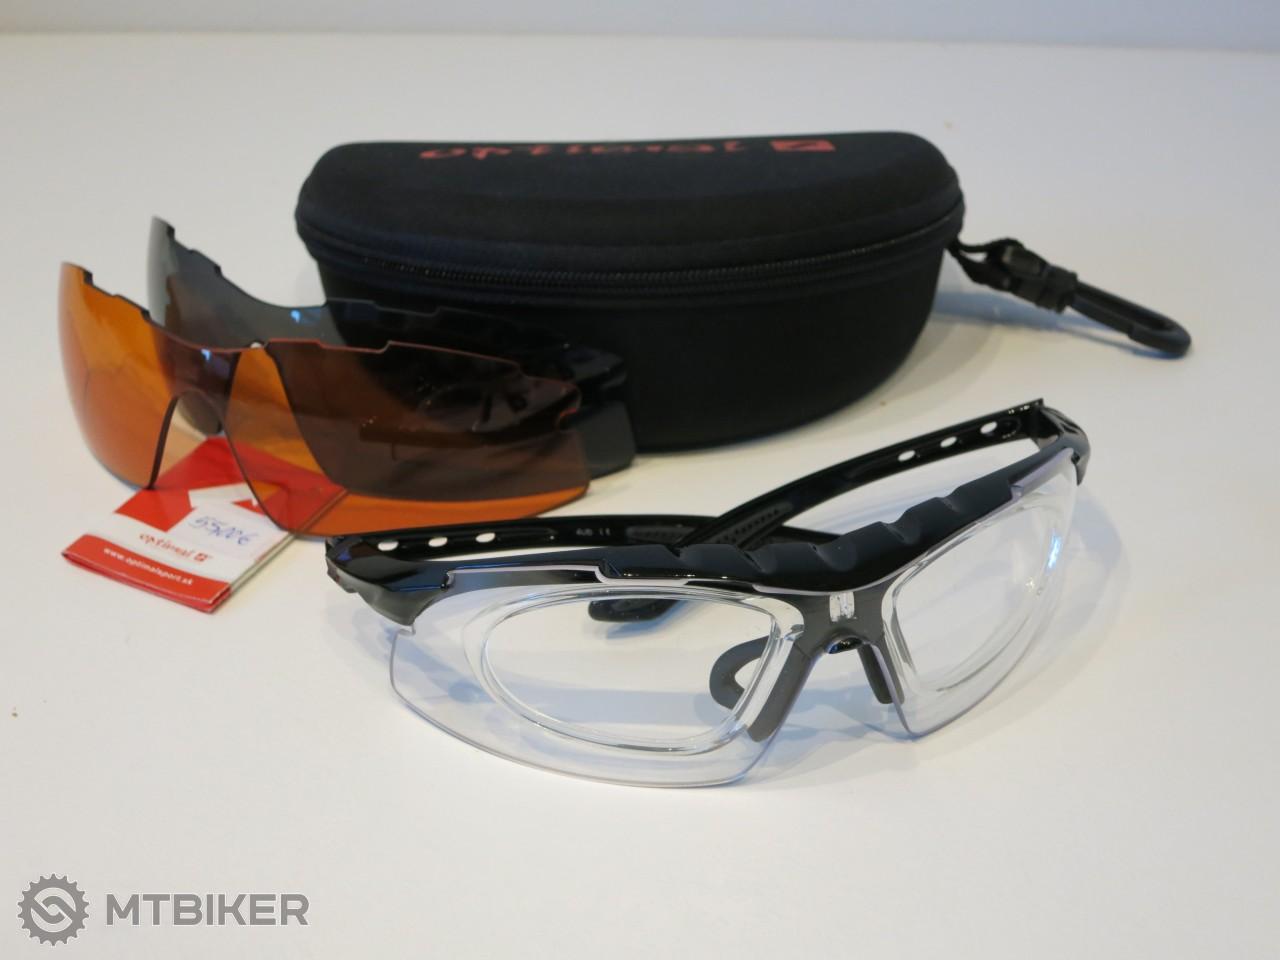 Okuliare Optimal - Príslušenstvo - Okuliare - Bazár MTBIKER c9c02f60a1e